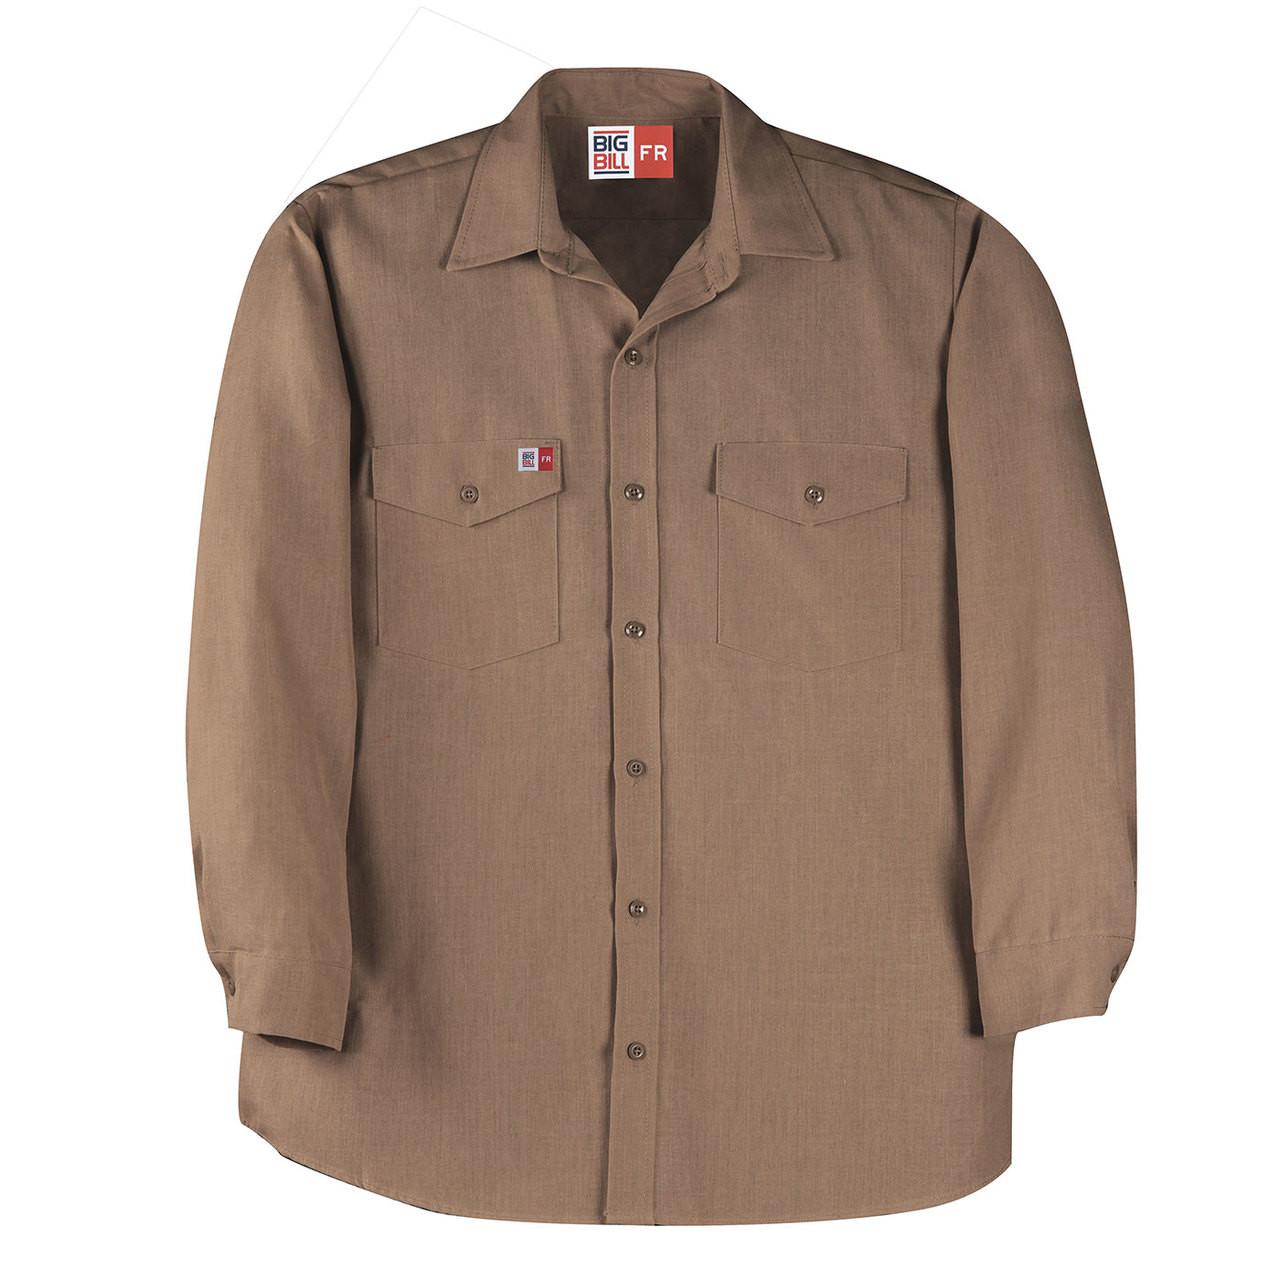 0c6d49dbe66 Big Bill FR 4.5 oz. Nomex Work Shirt TX290N4 Khaki